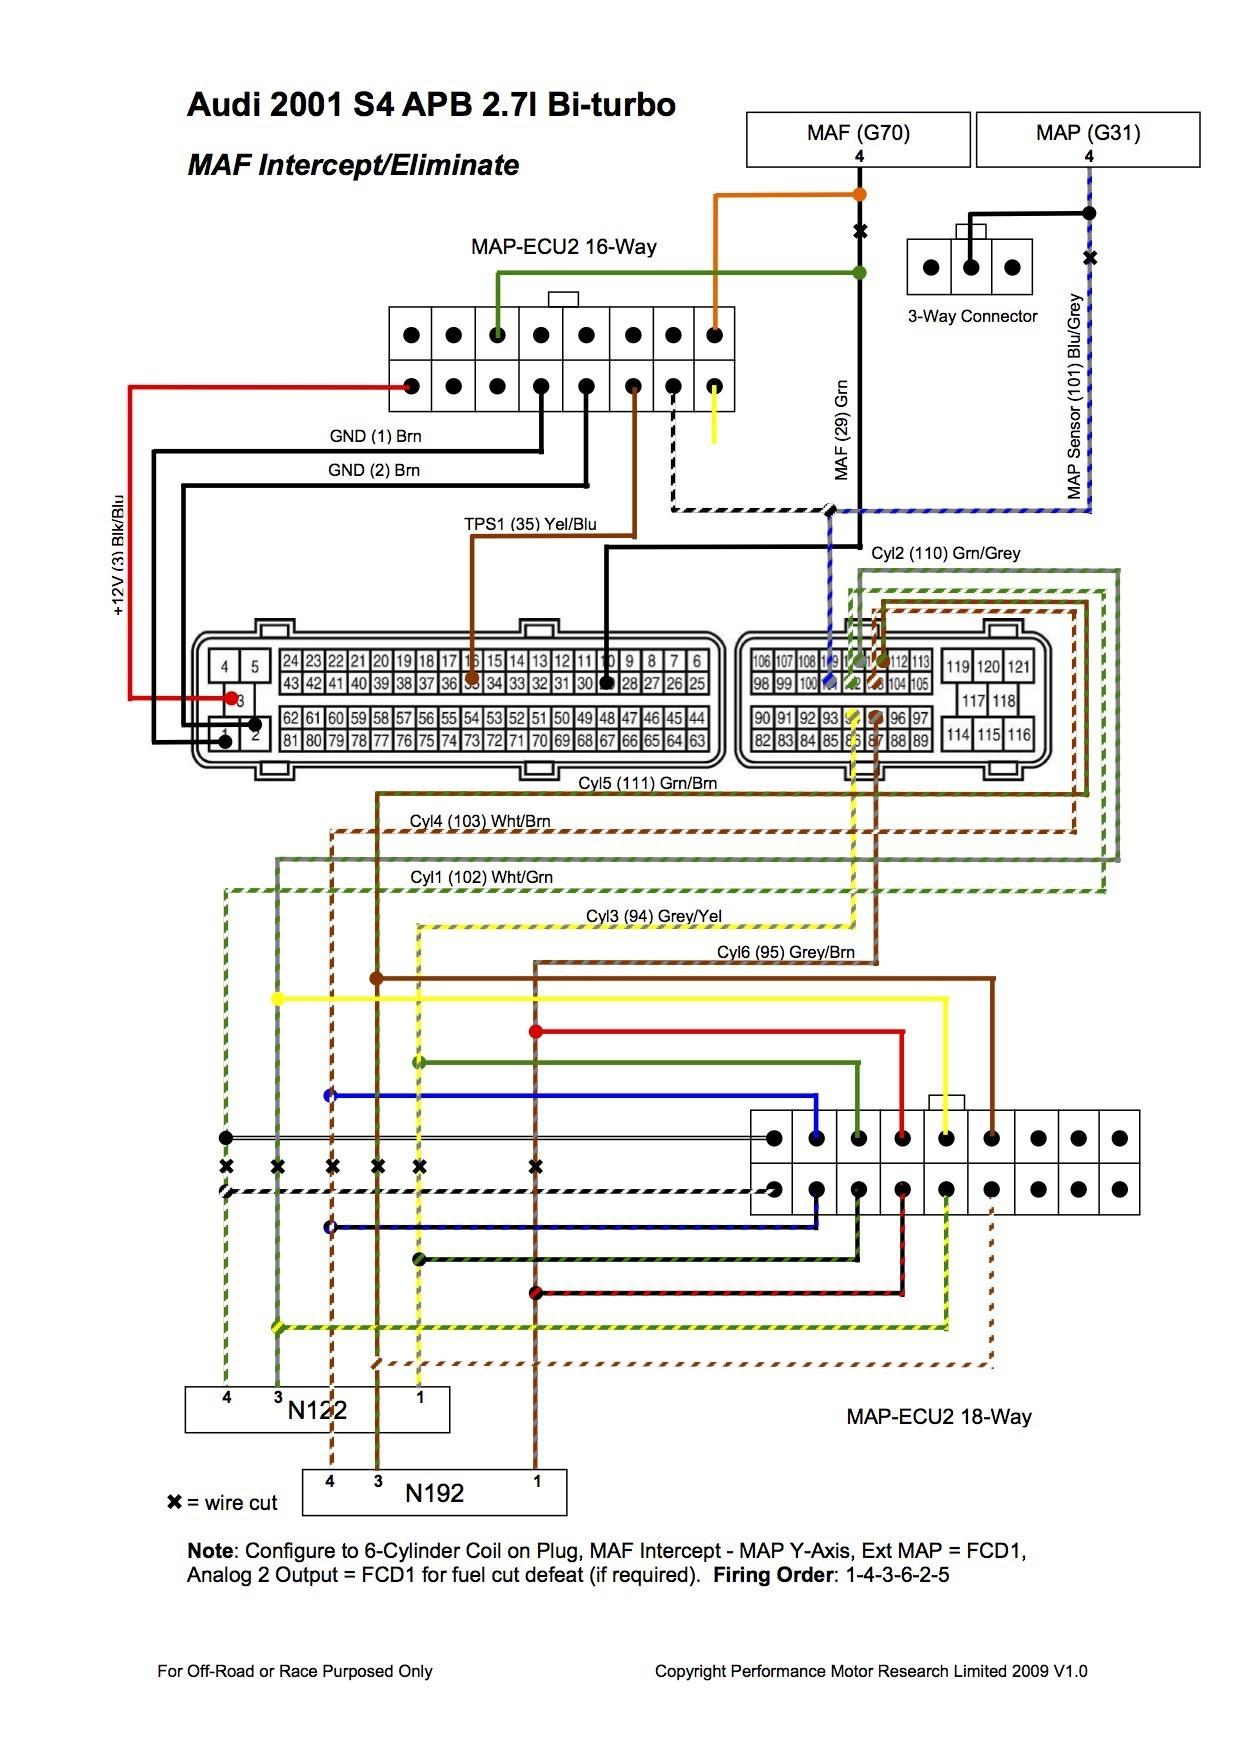 1999 Audi A4 Radio Wiring Diagram Valid 1995 Dodge Ram 1500 Transmission Wiring Diagram Best 2002 Dodge Ram